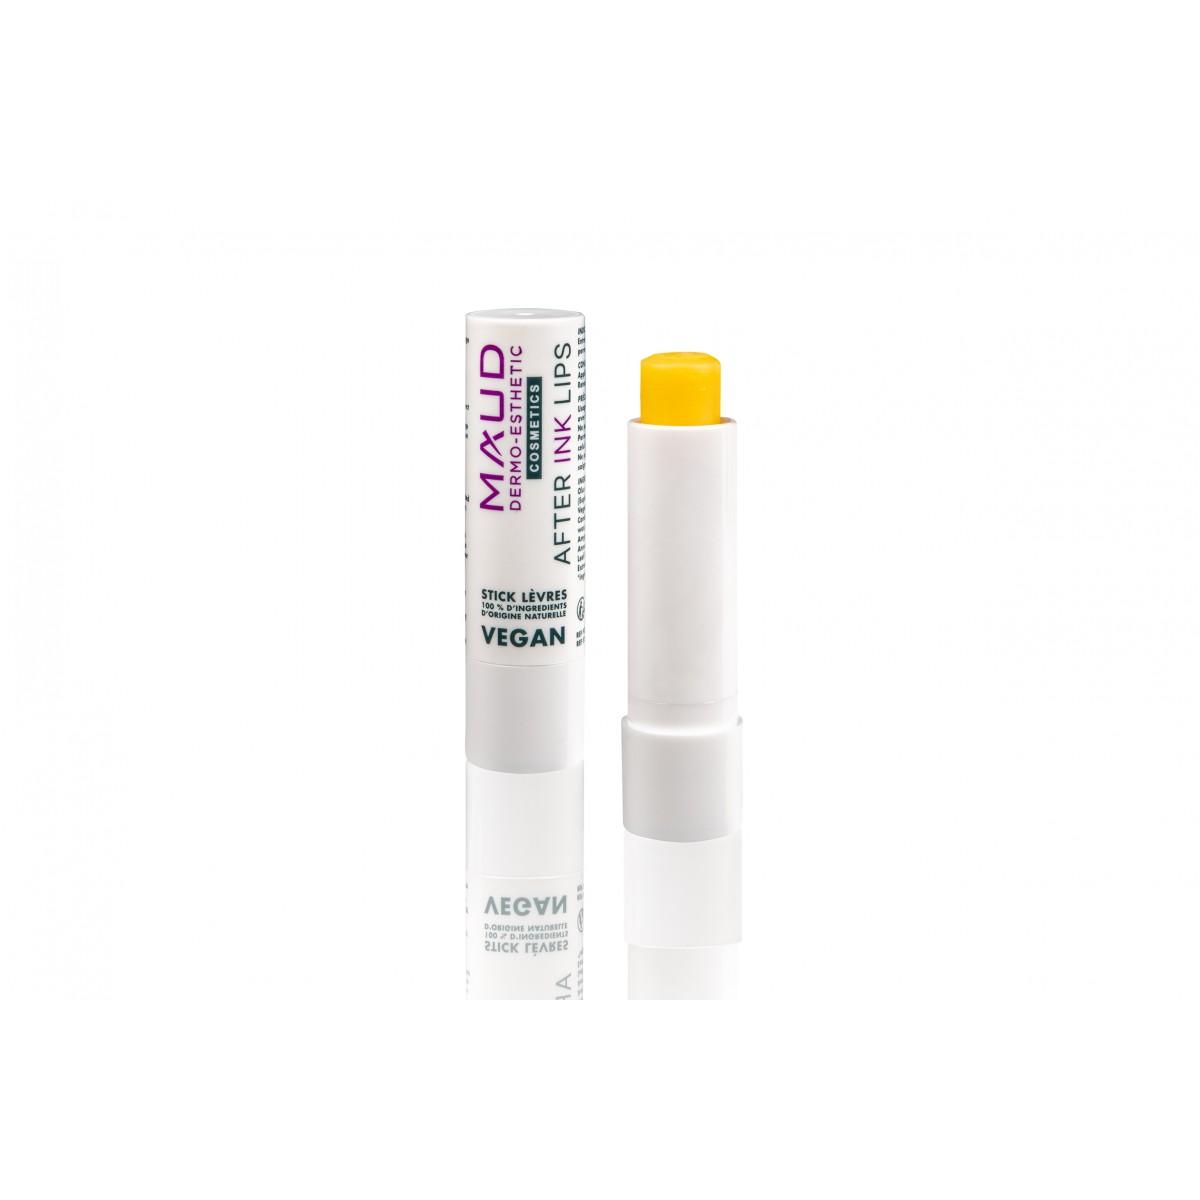 Soins maquillage permanent - MAUD COSMETICS - STICK CICATRISANT DERMOPIGMENTATION LIVRES AFTER INK LIPS VEGAN (4 g)